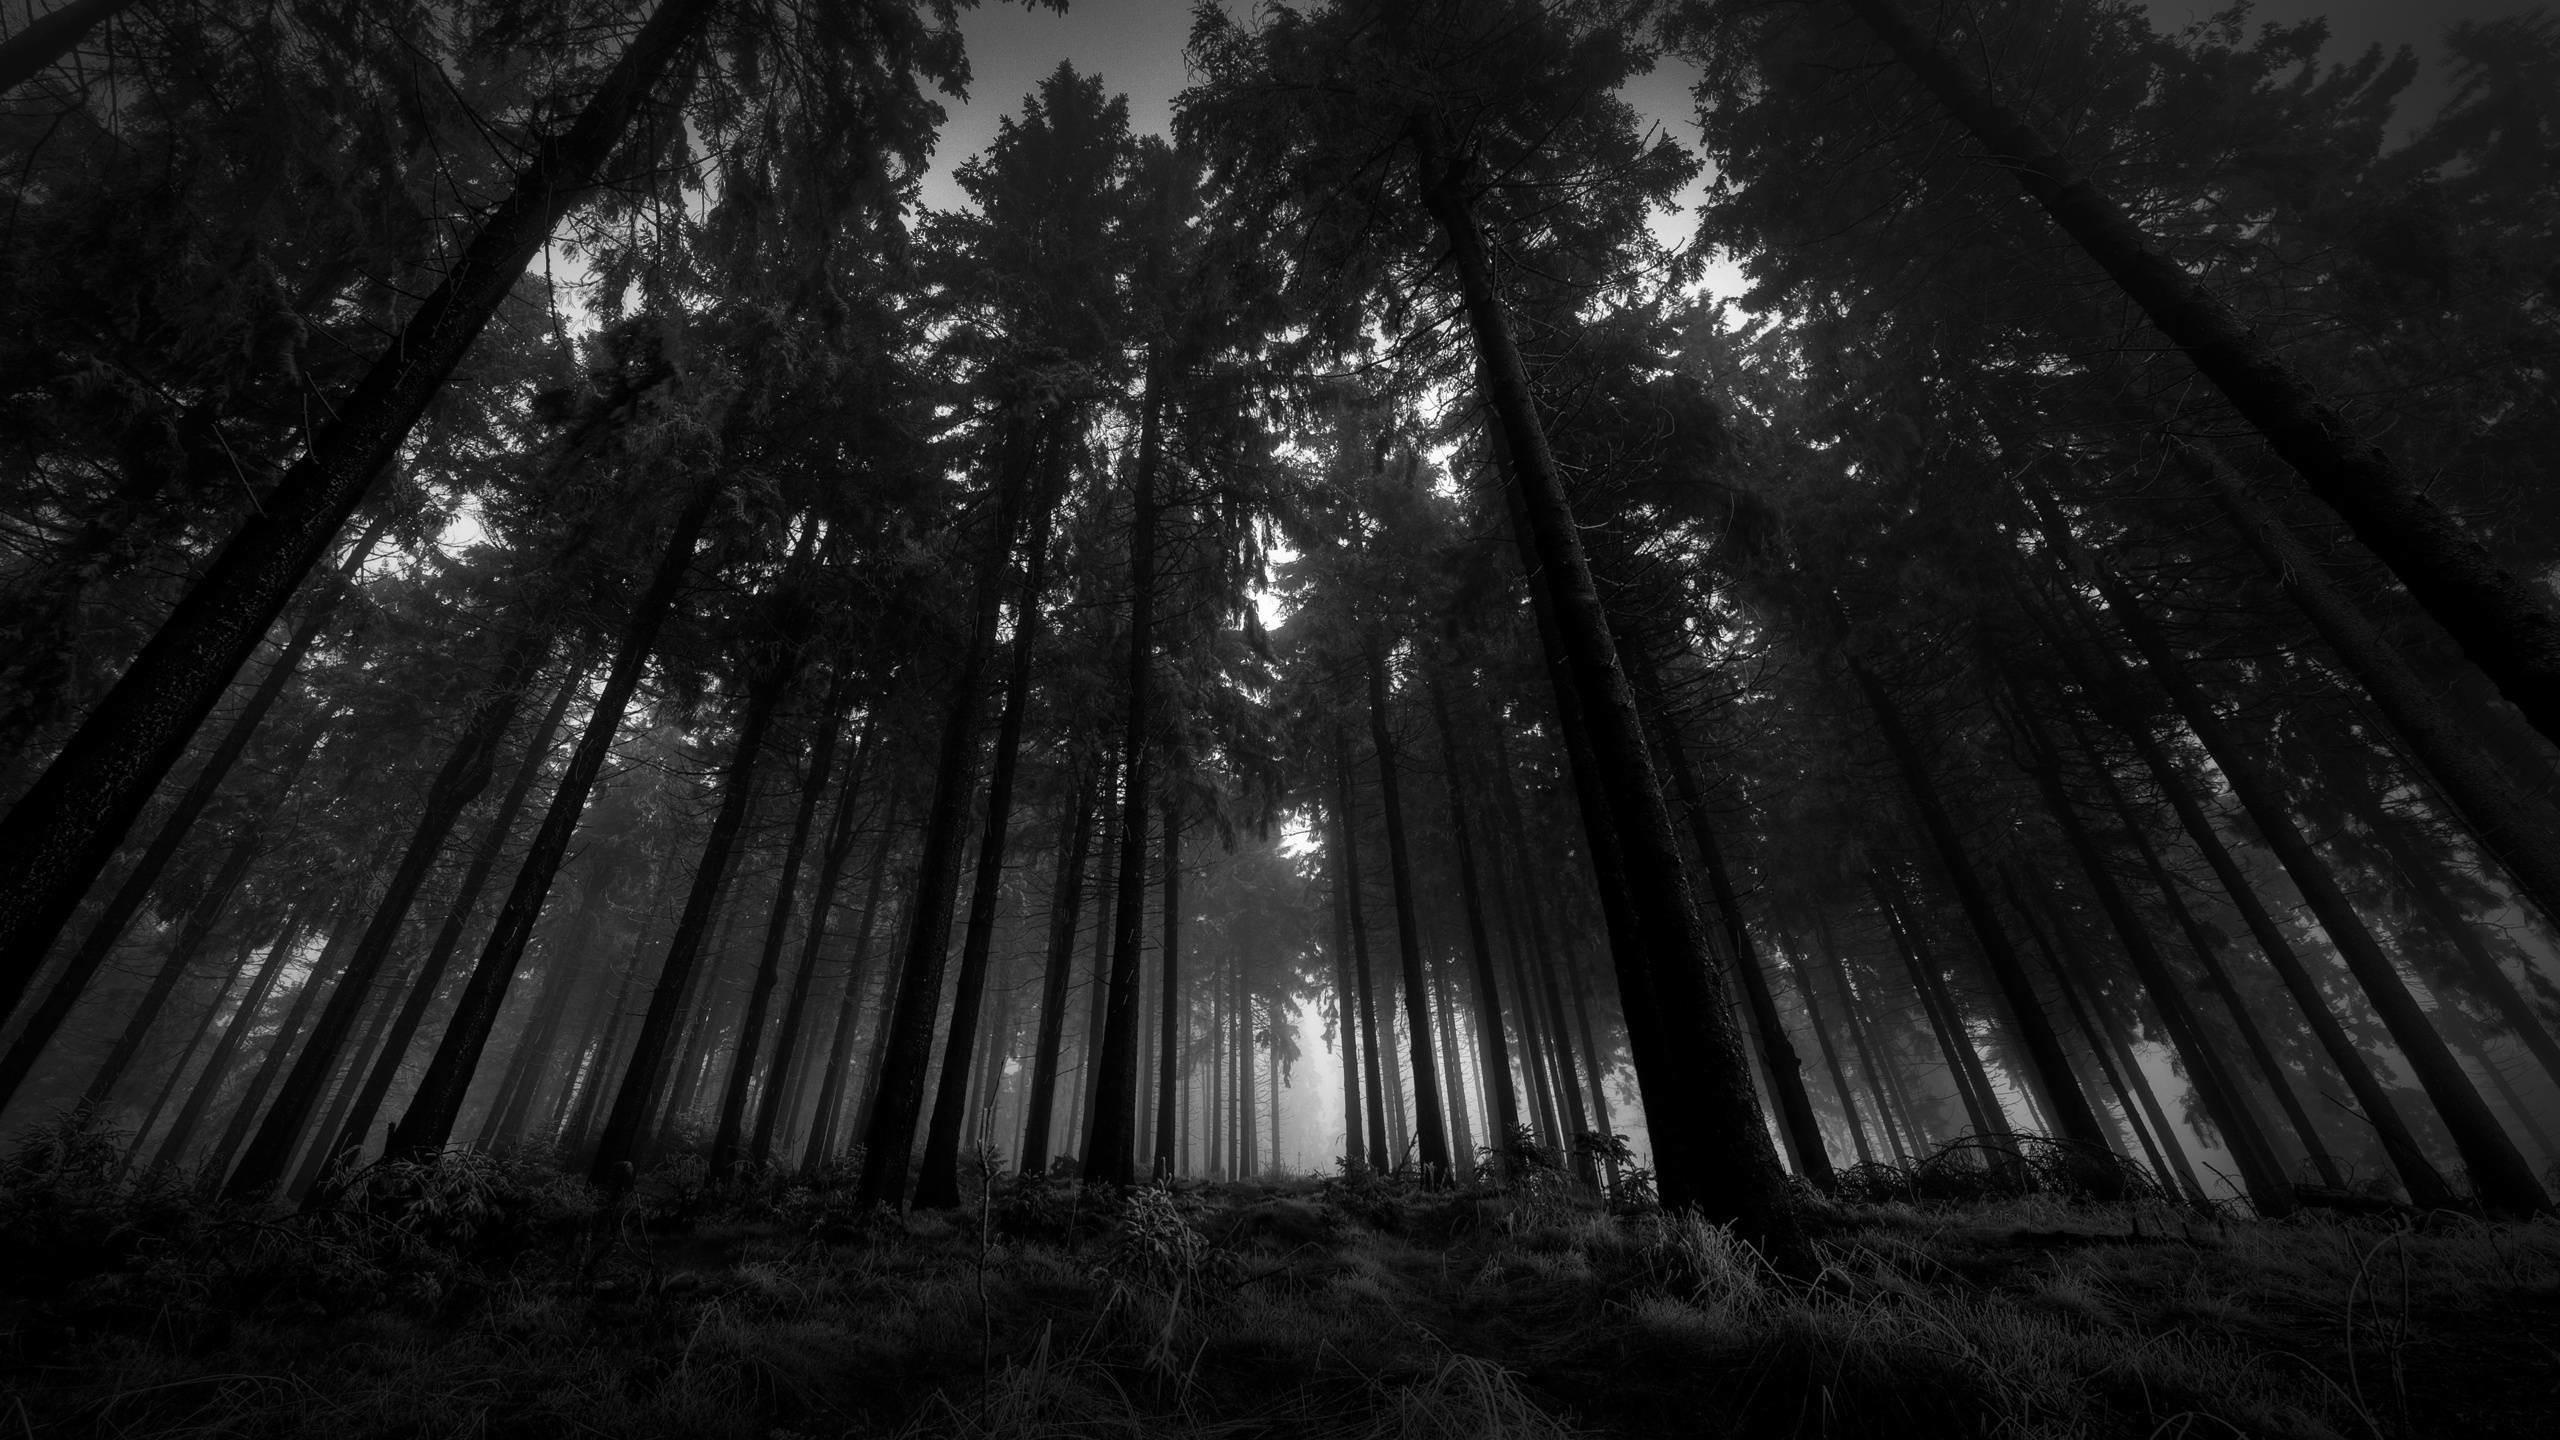 Dark Forest Moon High Definition Wallpaper – HD Wallpapers